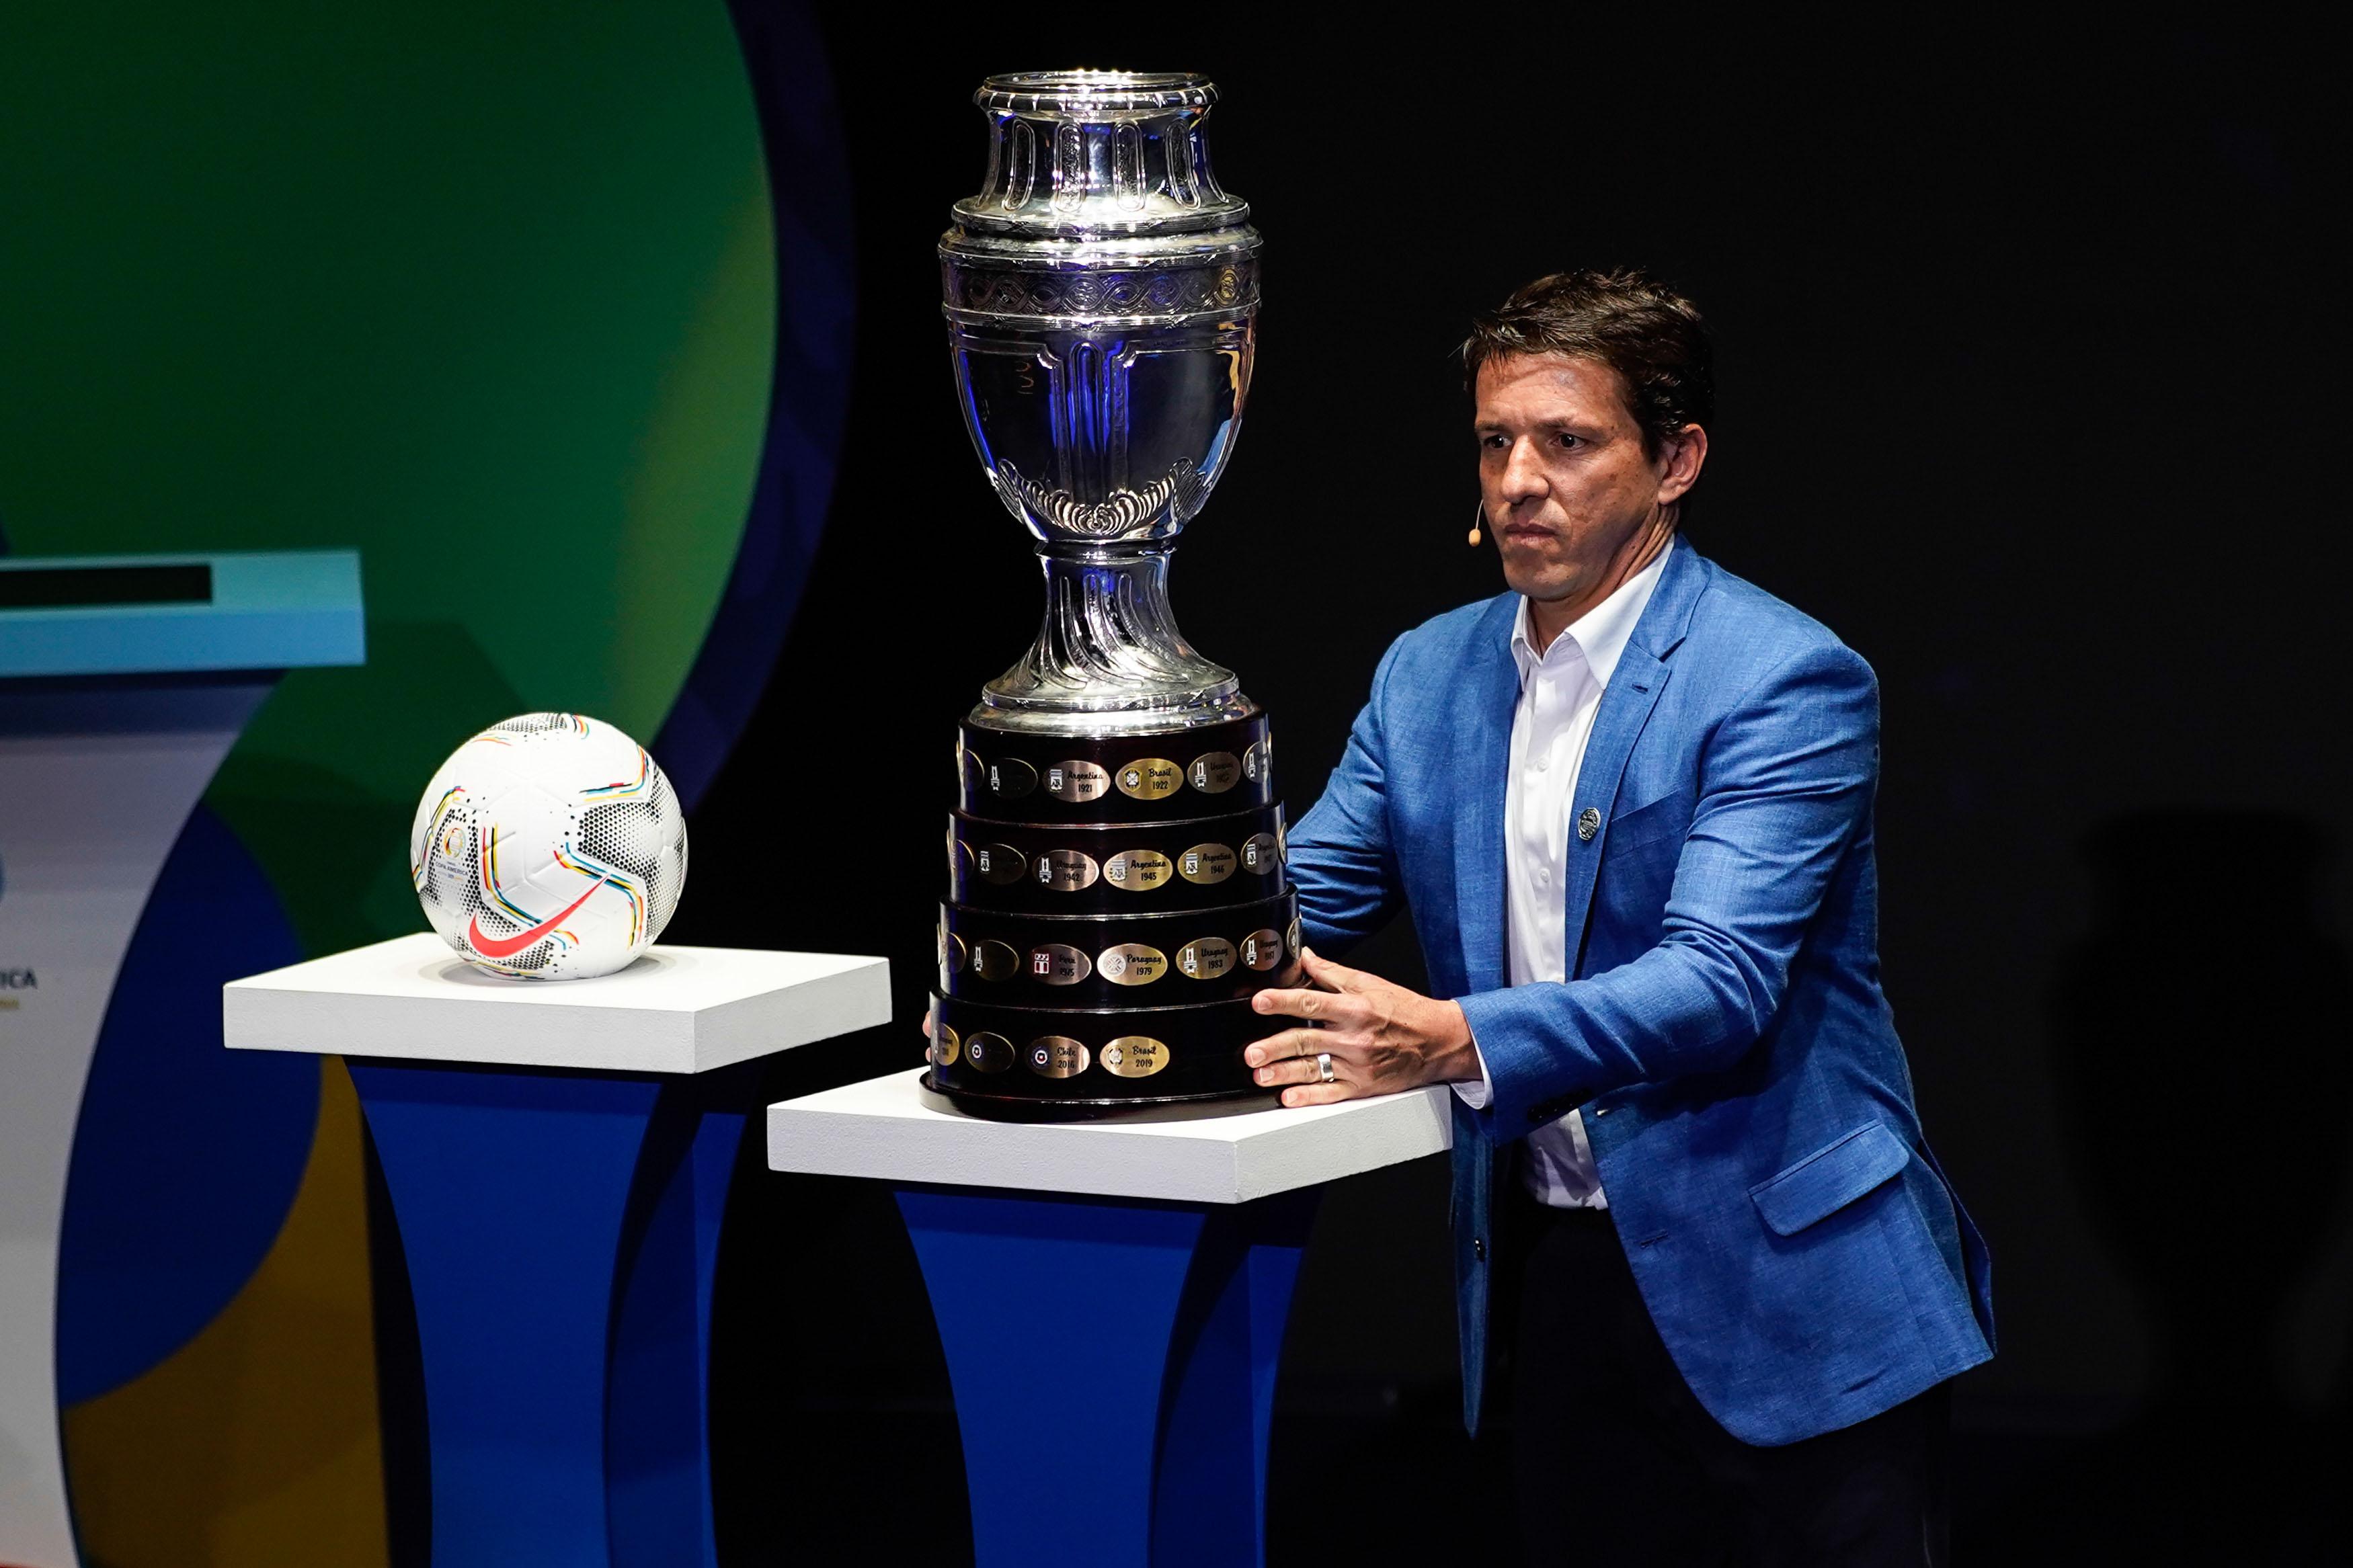 (SP)COLOMBIA-CARTAGENA-FOOTBALL-COPA AMERICA-DRAW